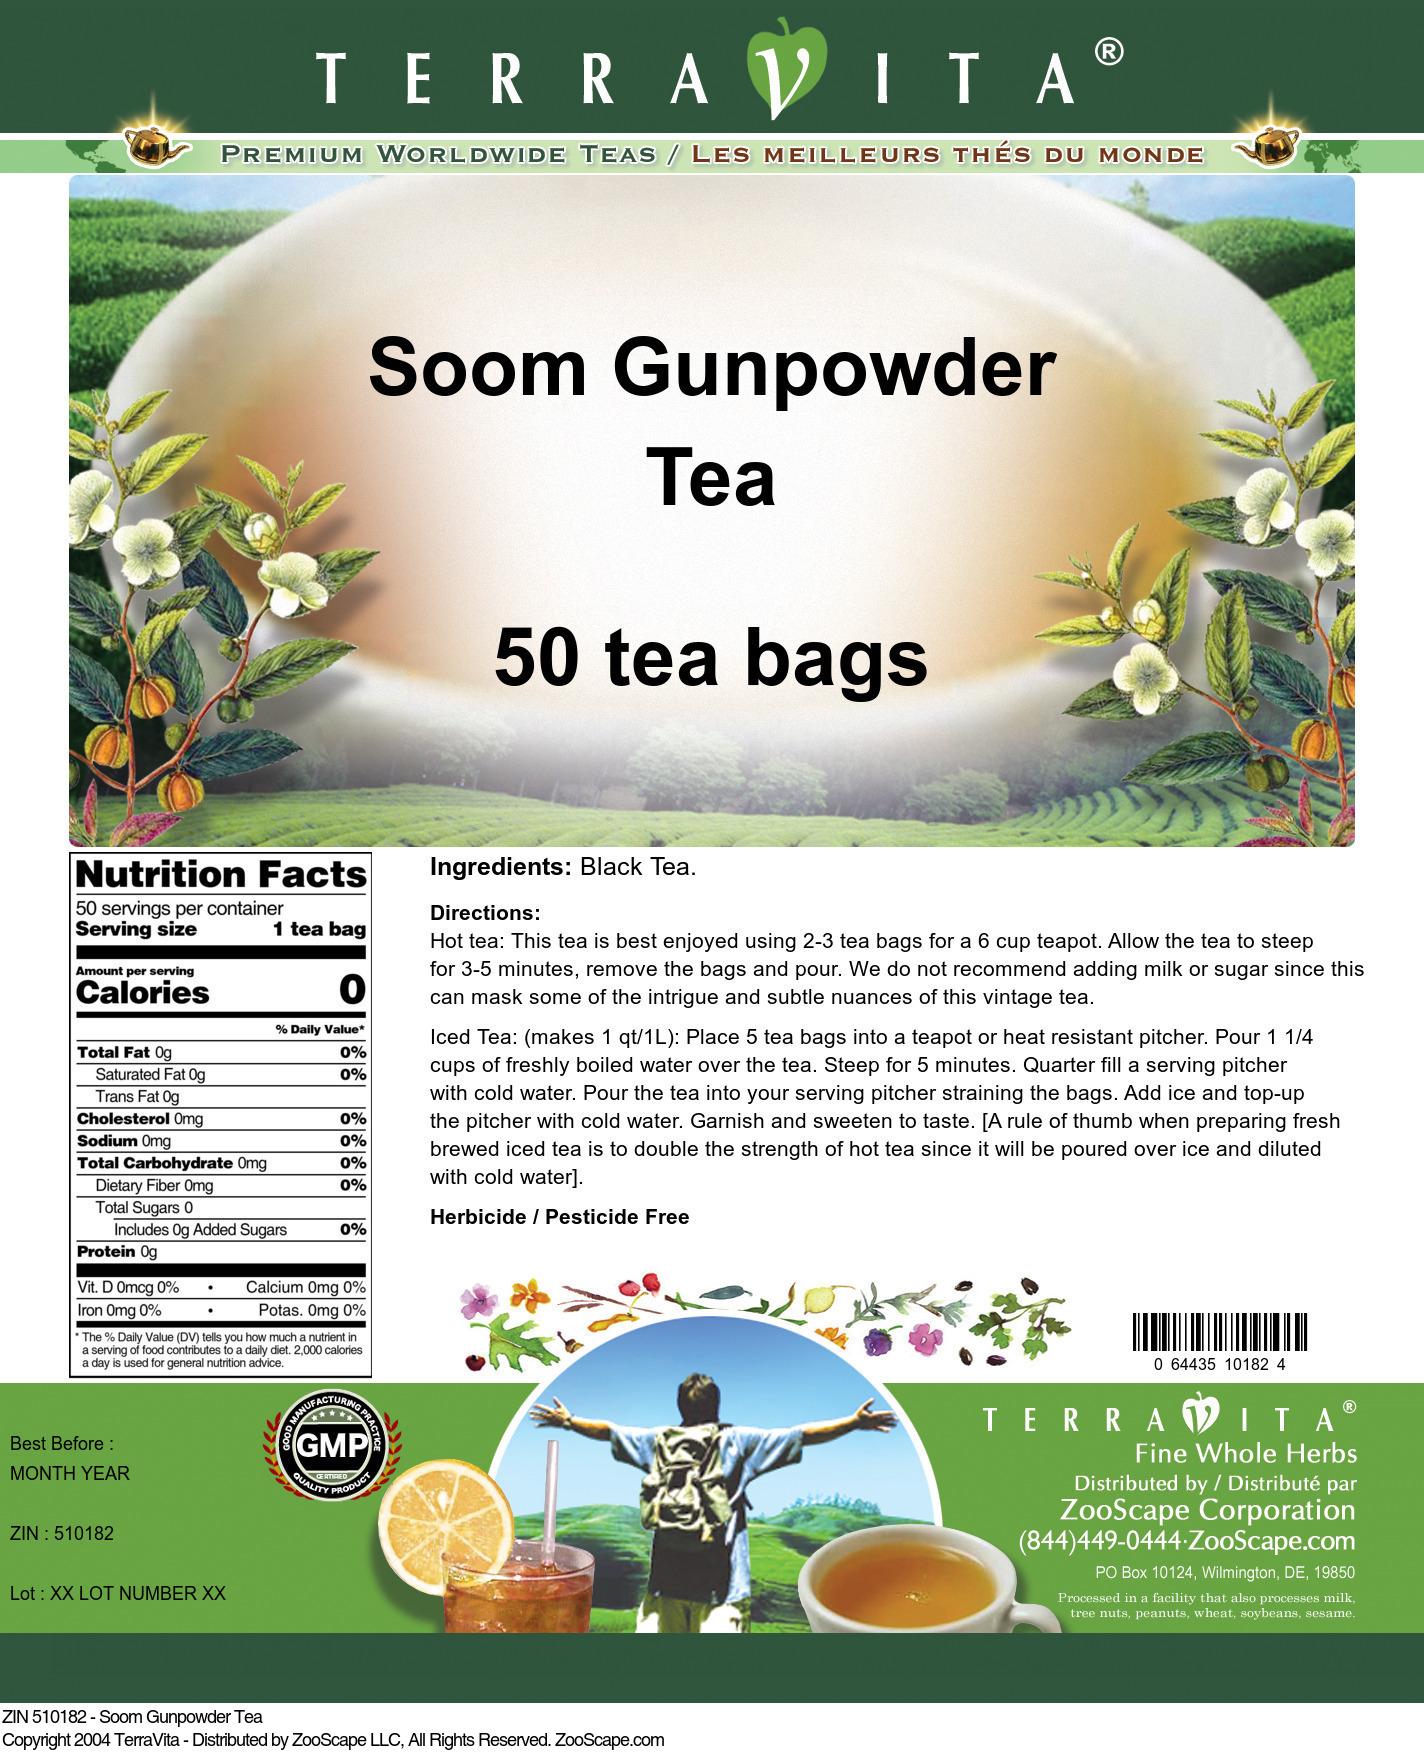 Soom Gunpowder